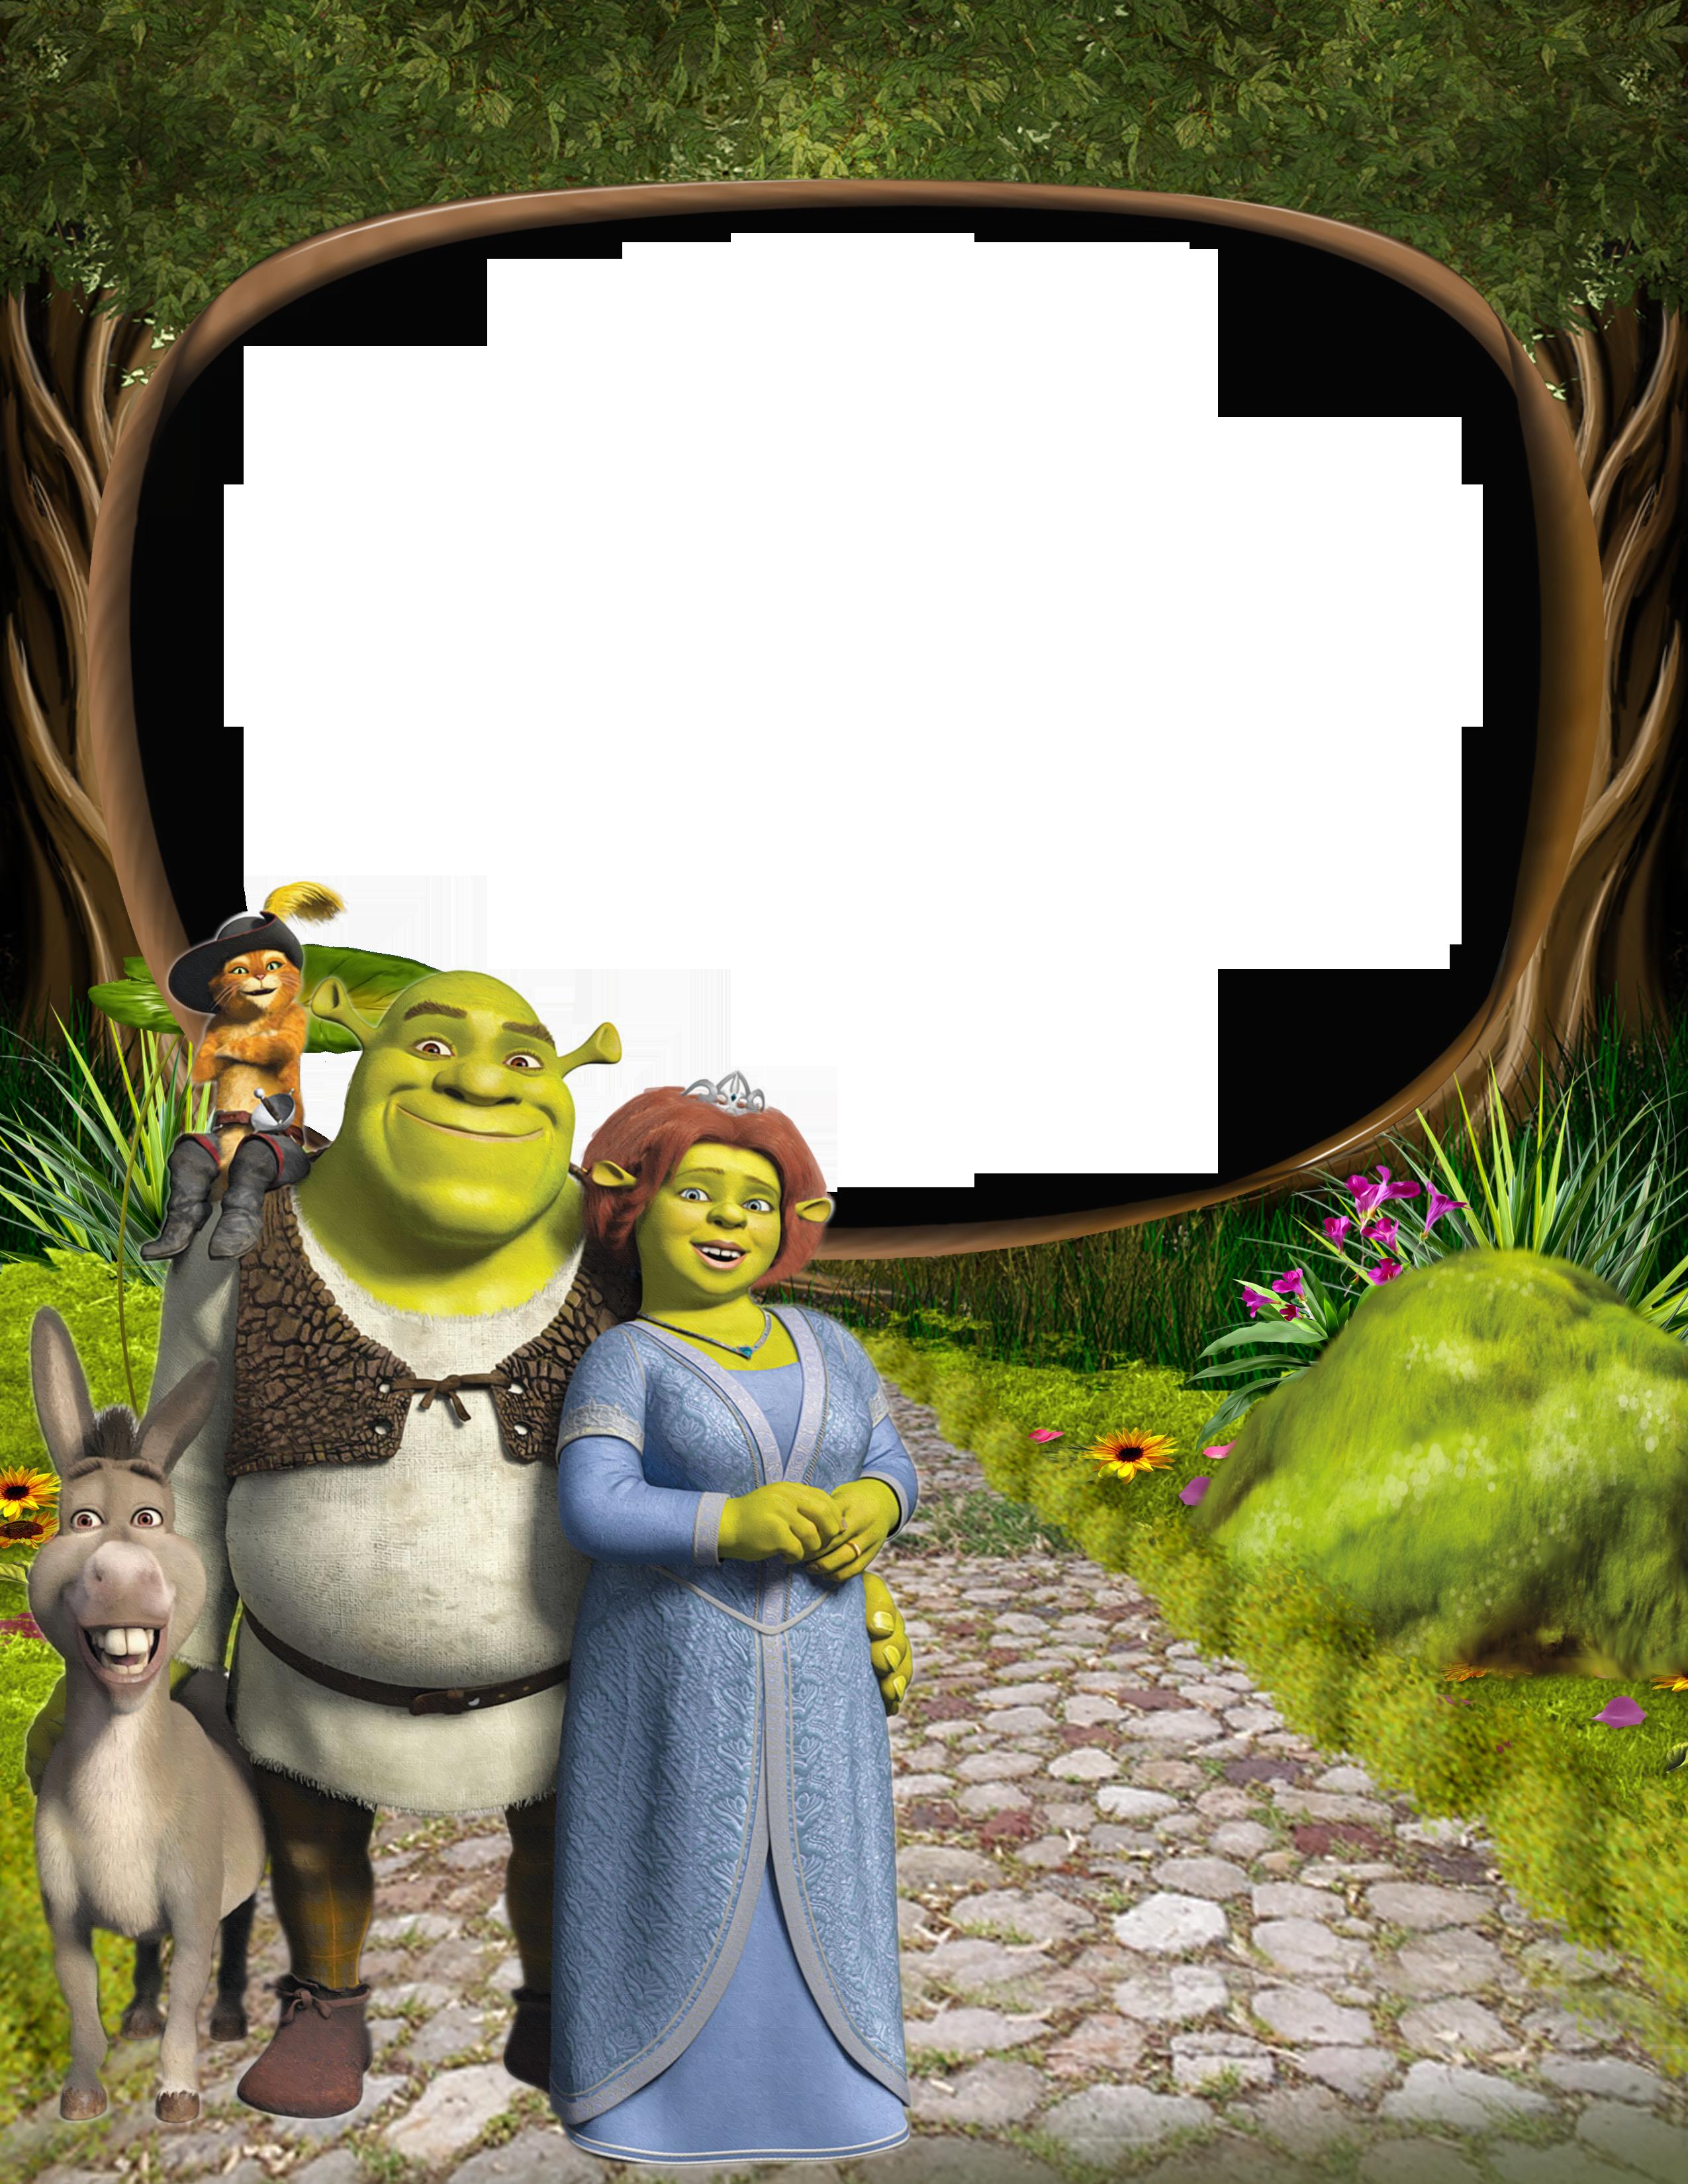 Valentines shrek clipart graphic freeuse library Shrek and Princess Fiona PNG Kids Frame | Gallery ... graphic freeuse library